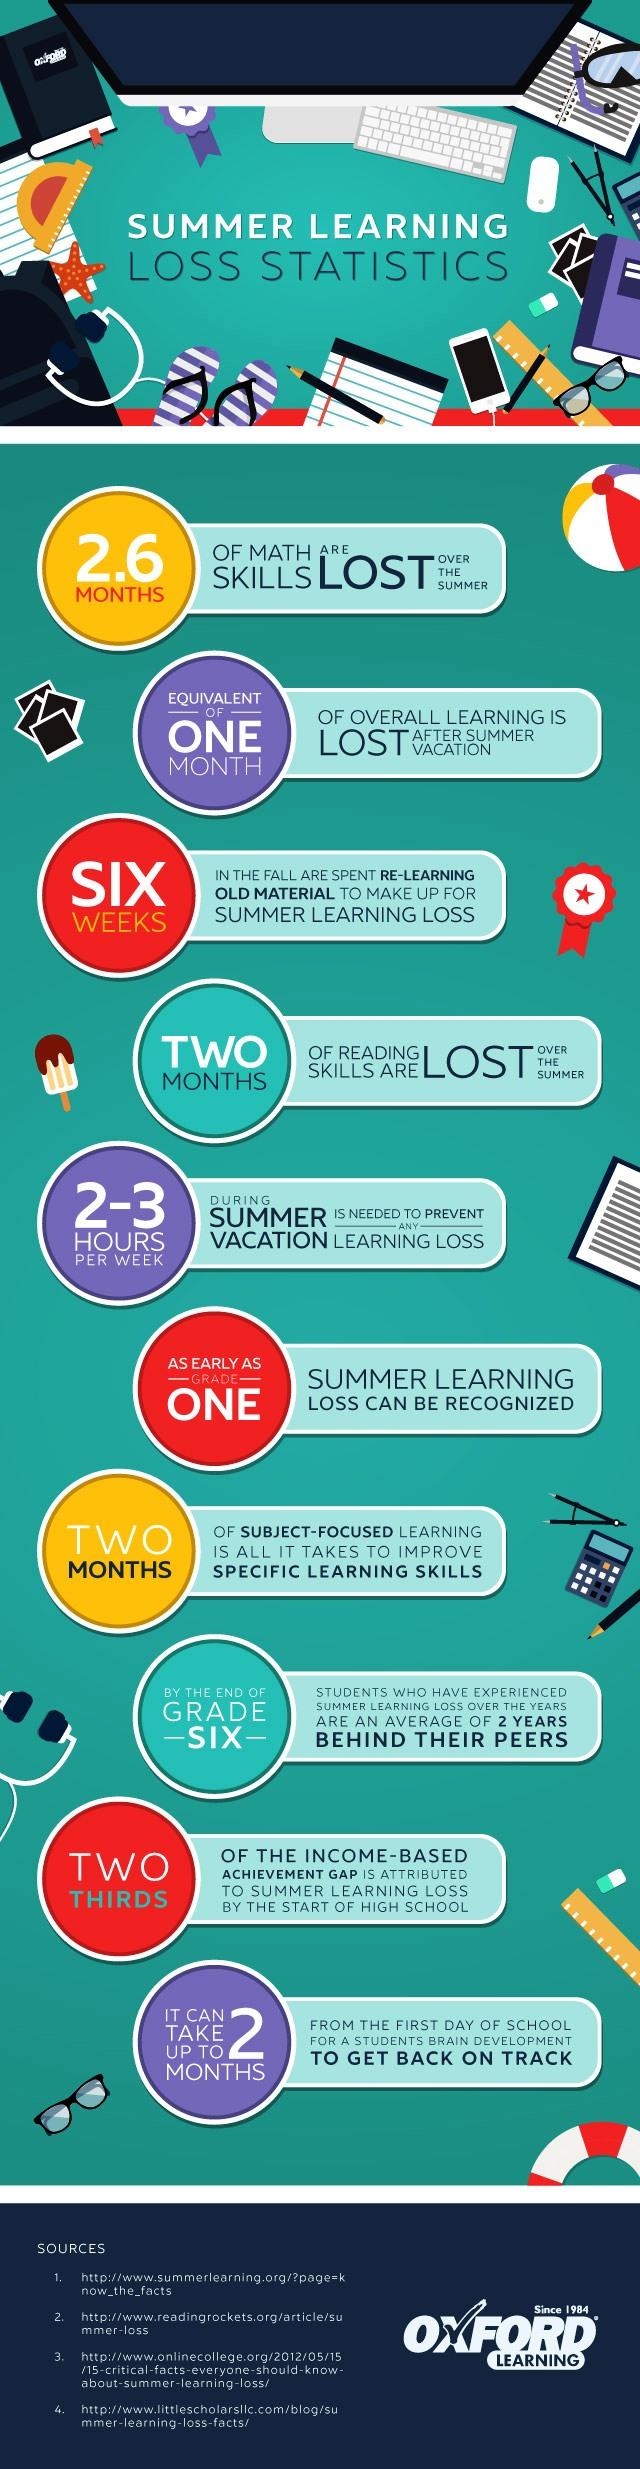 summerlearningloss